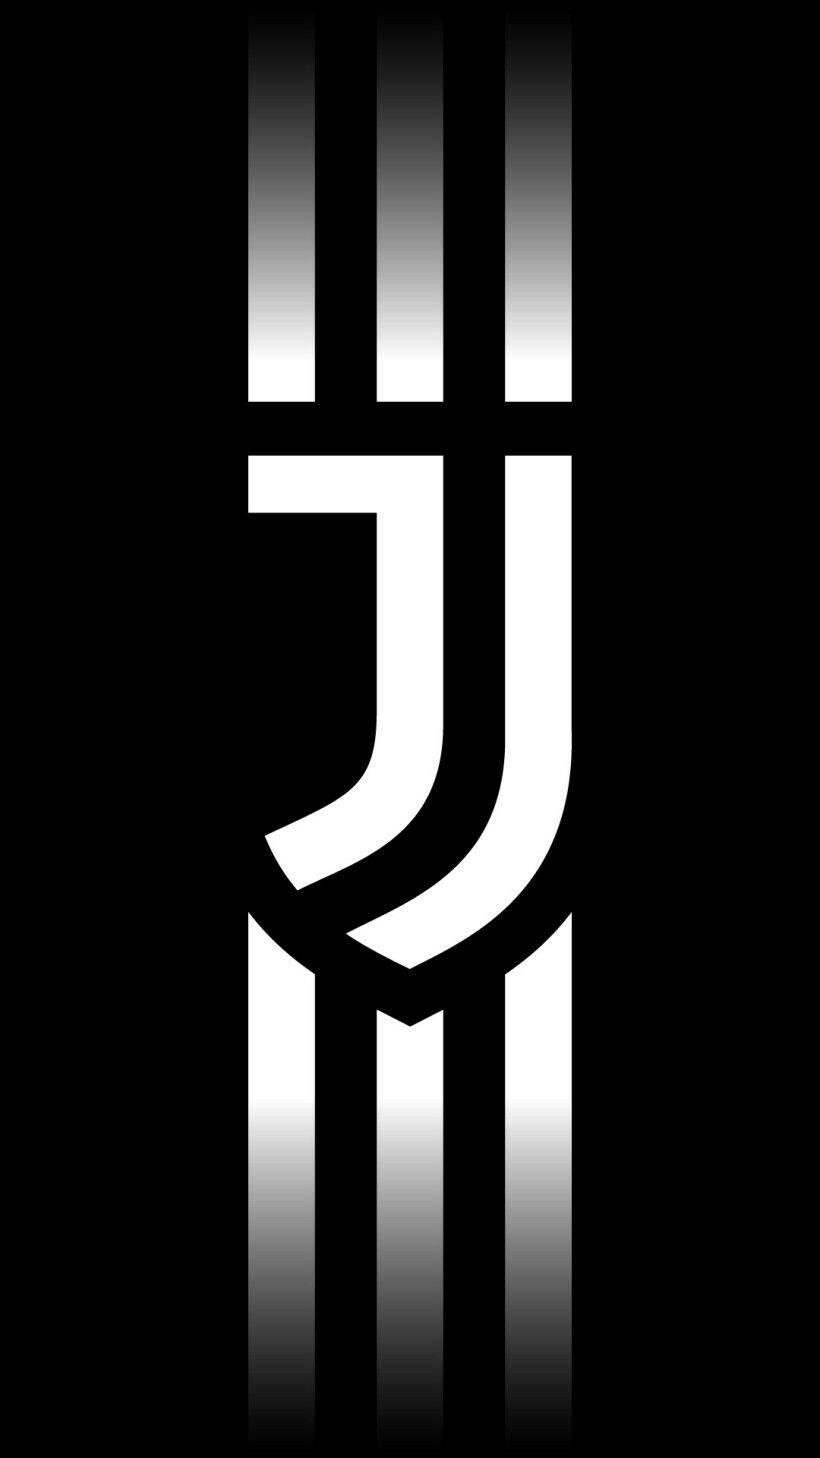 Most Inspiring Wallpaper Logo Messi - d8d36977d33e92f155c0dc76e45e5dc2  Gallery_4792100.jpg